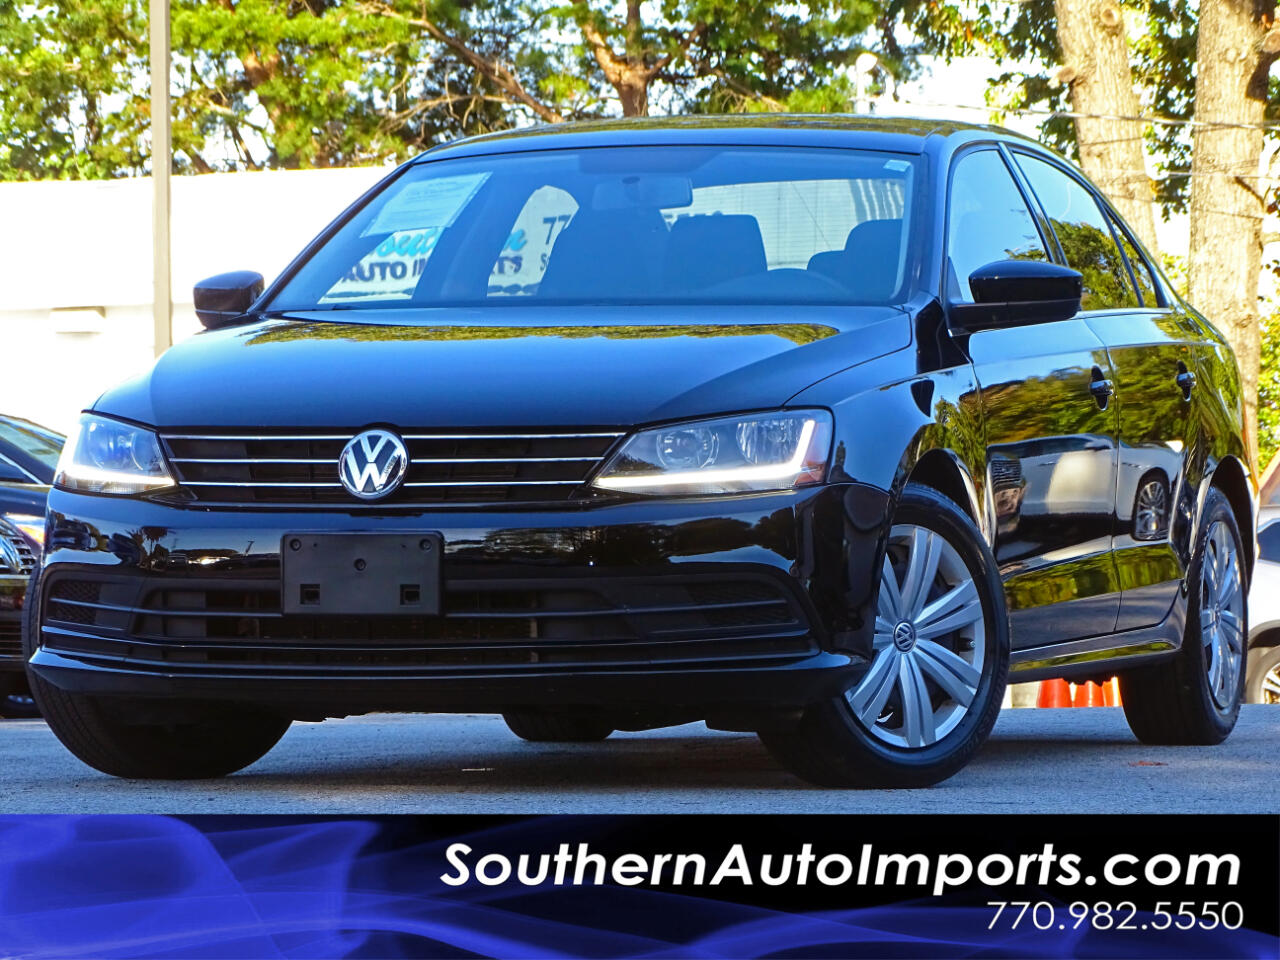 2017 Volkswagen Jetta 1.4T S w/Back Up Camera 1owner